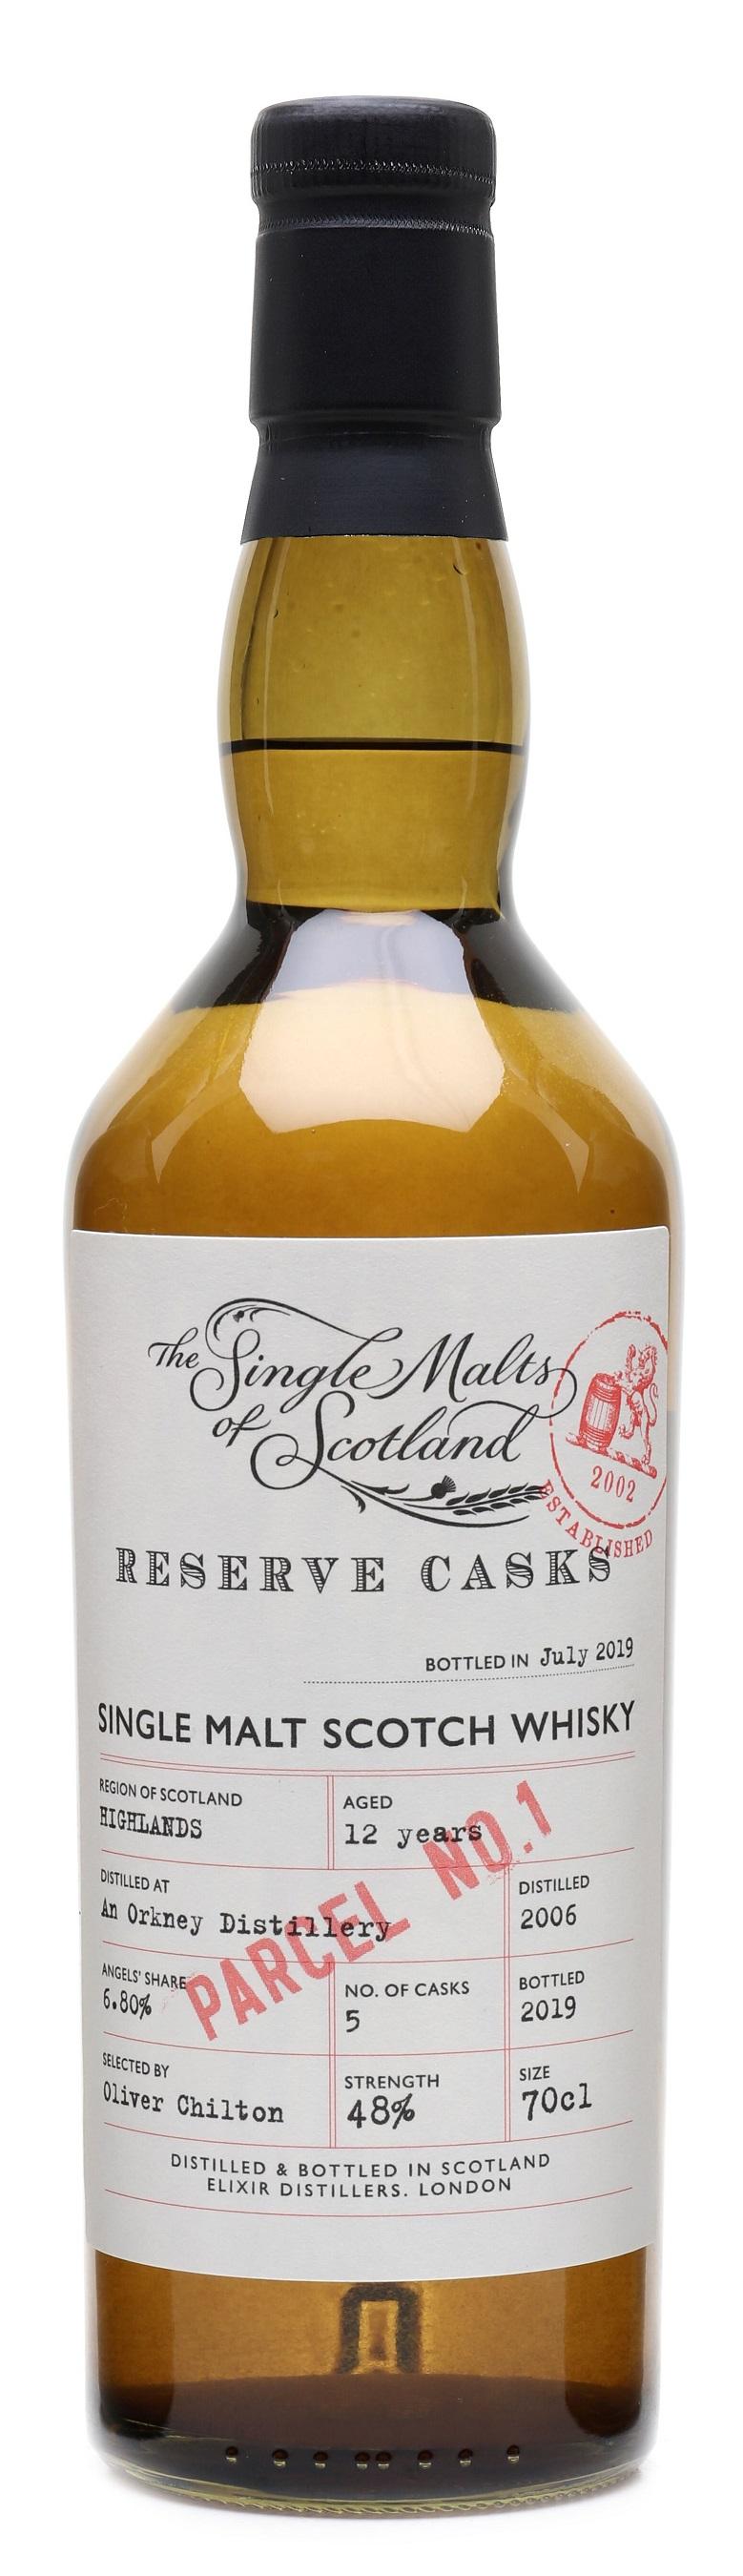 An Orkney Distillery 12 yrs Single Malts of Scotland